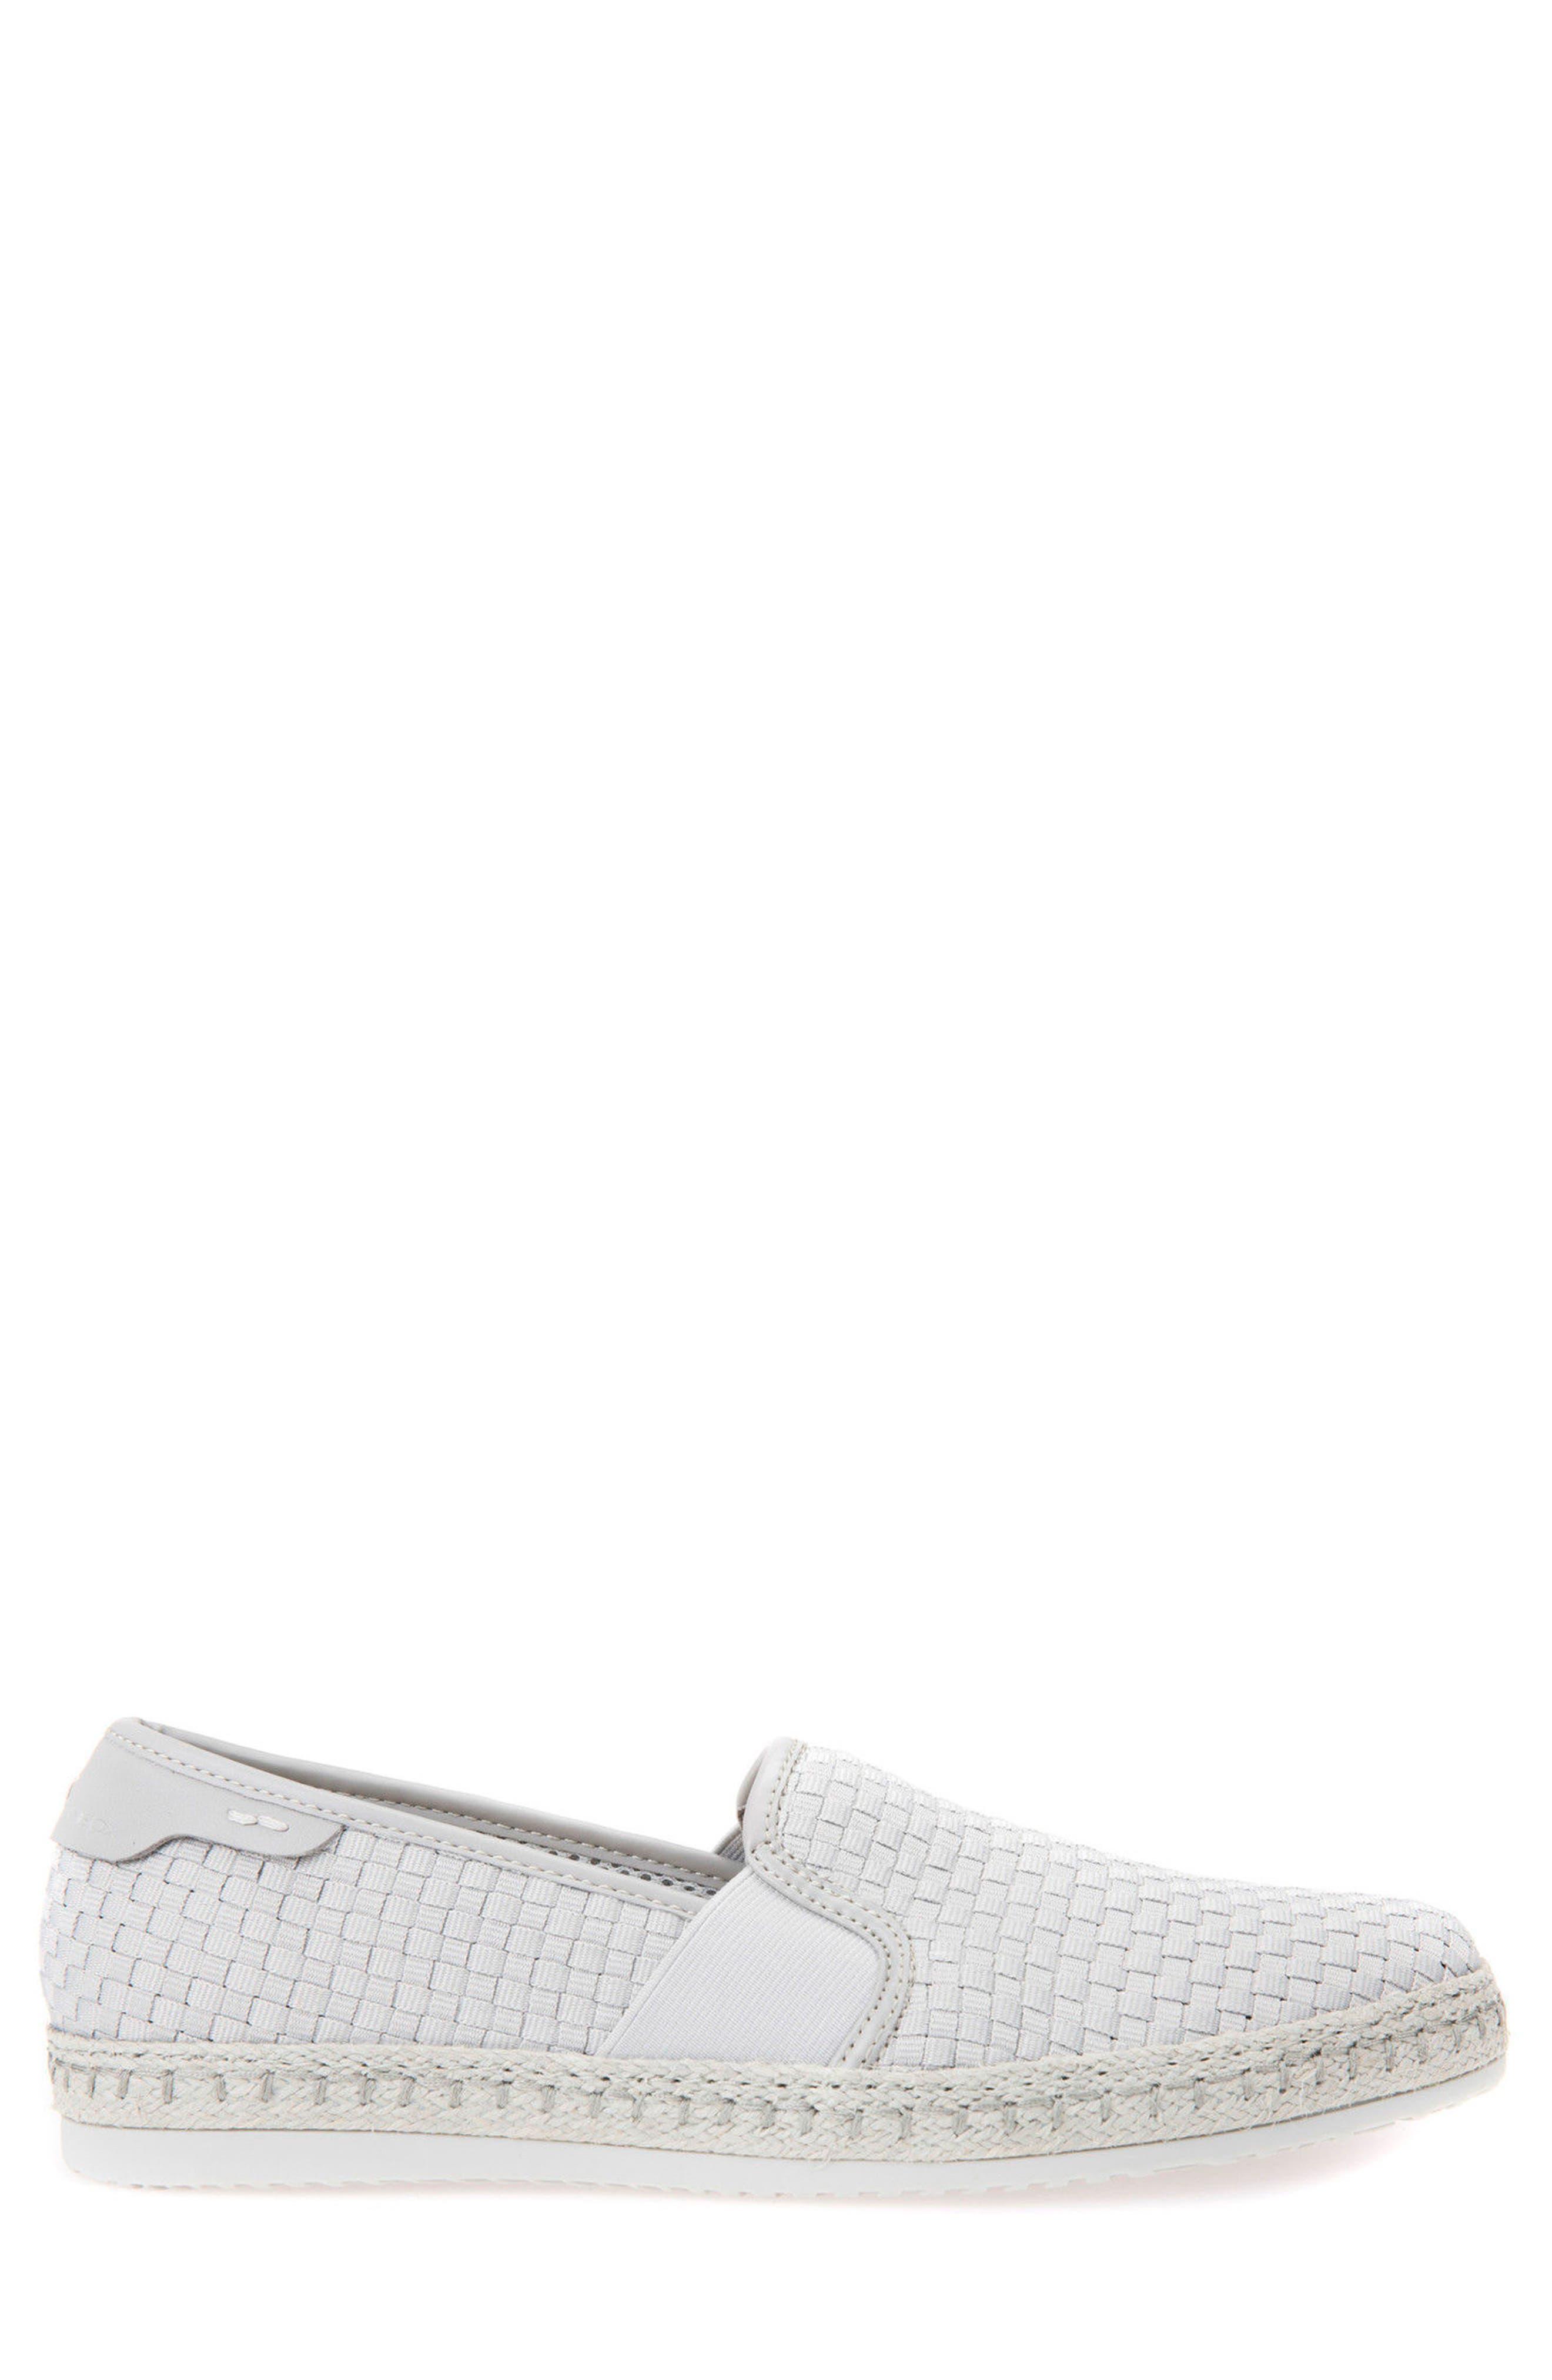 Copacaban 10 Woven Slip-On Sneaker,                             Alternate thumbnail 3, color,                             050